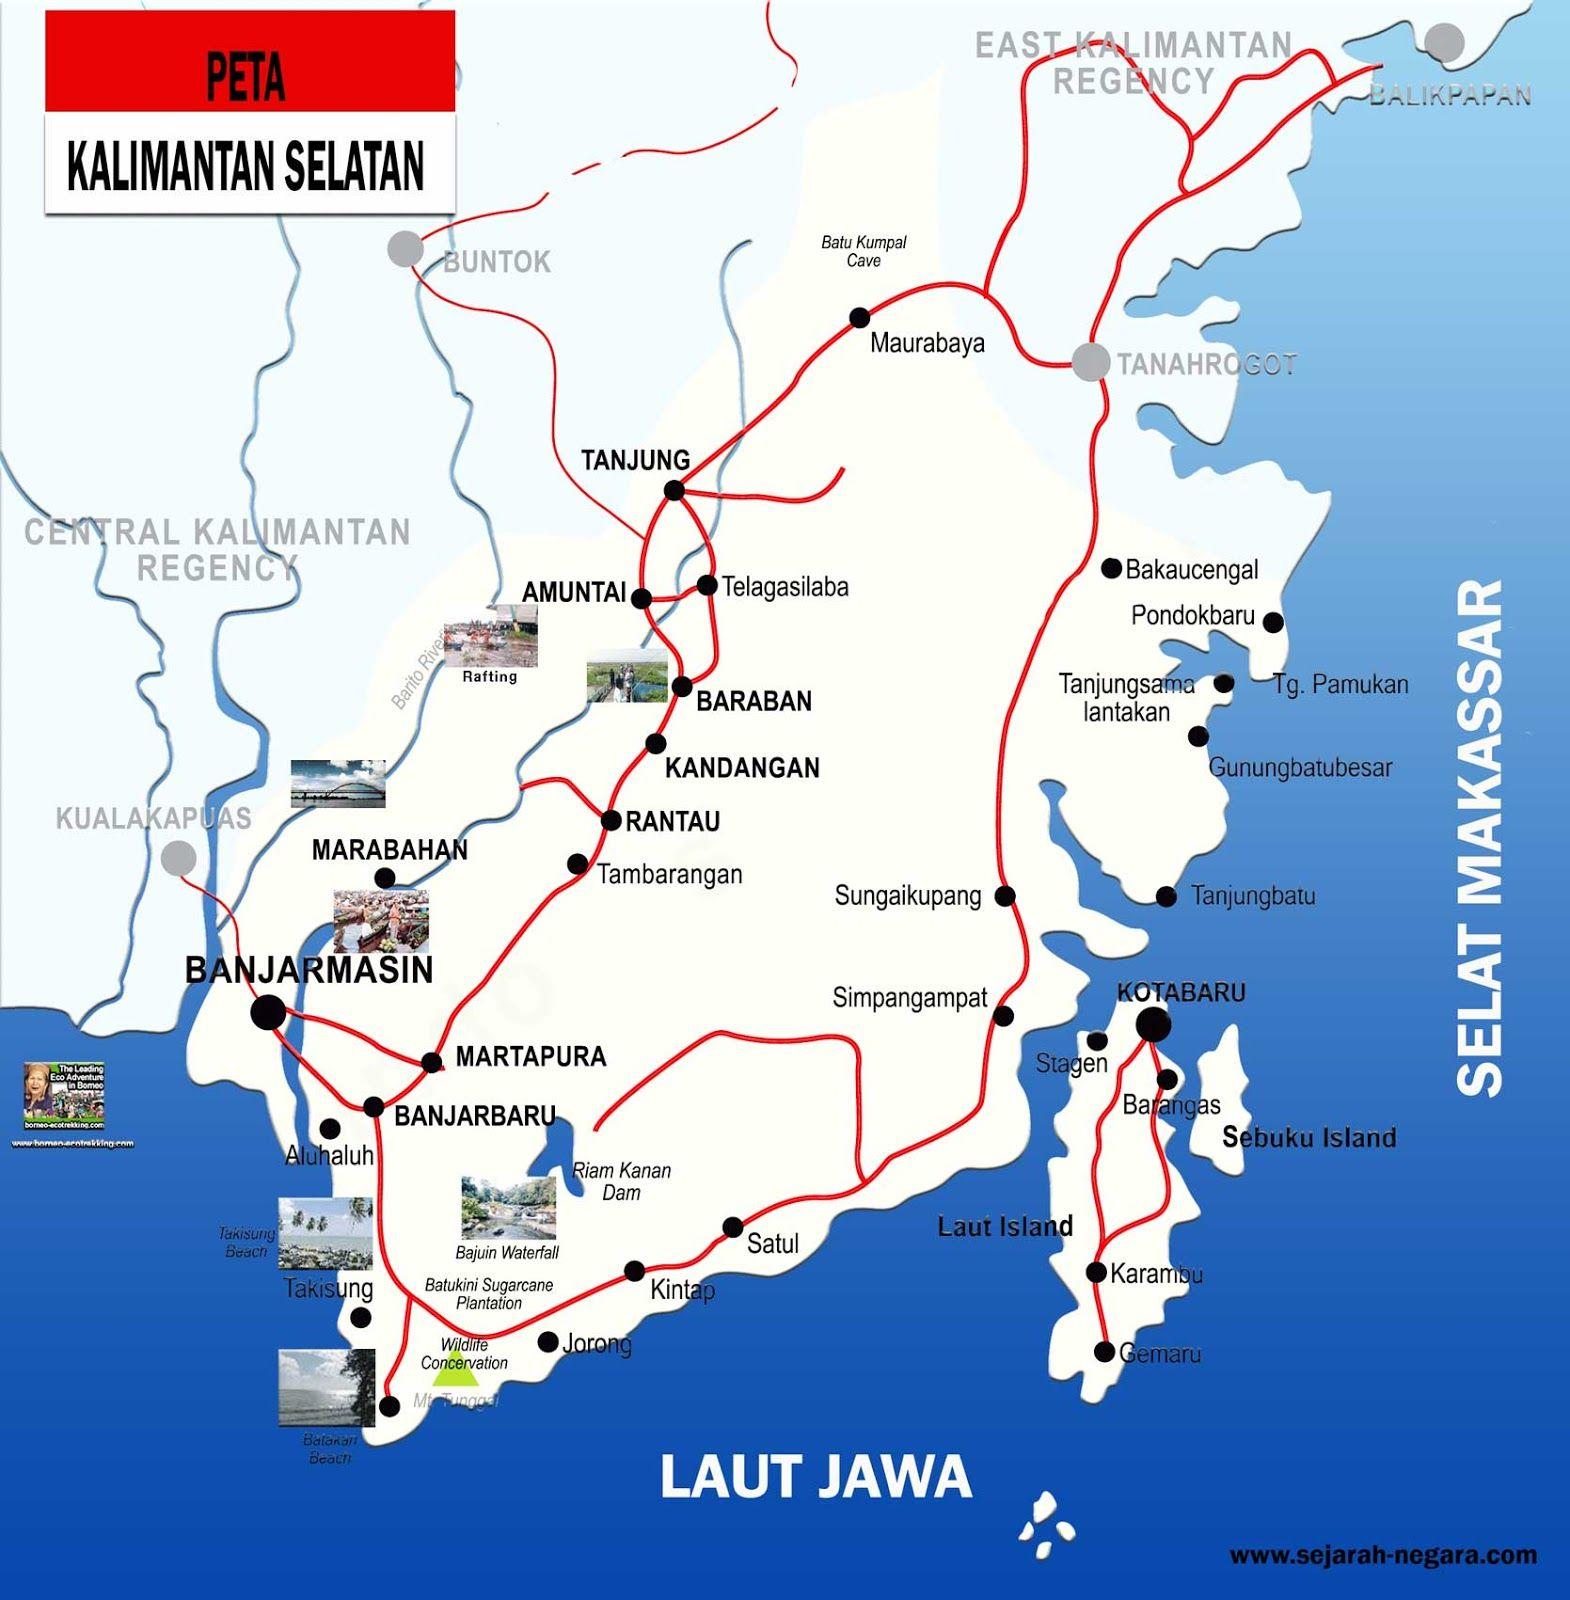 Related image Kalimantan, Lautan